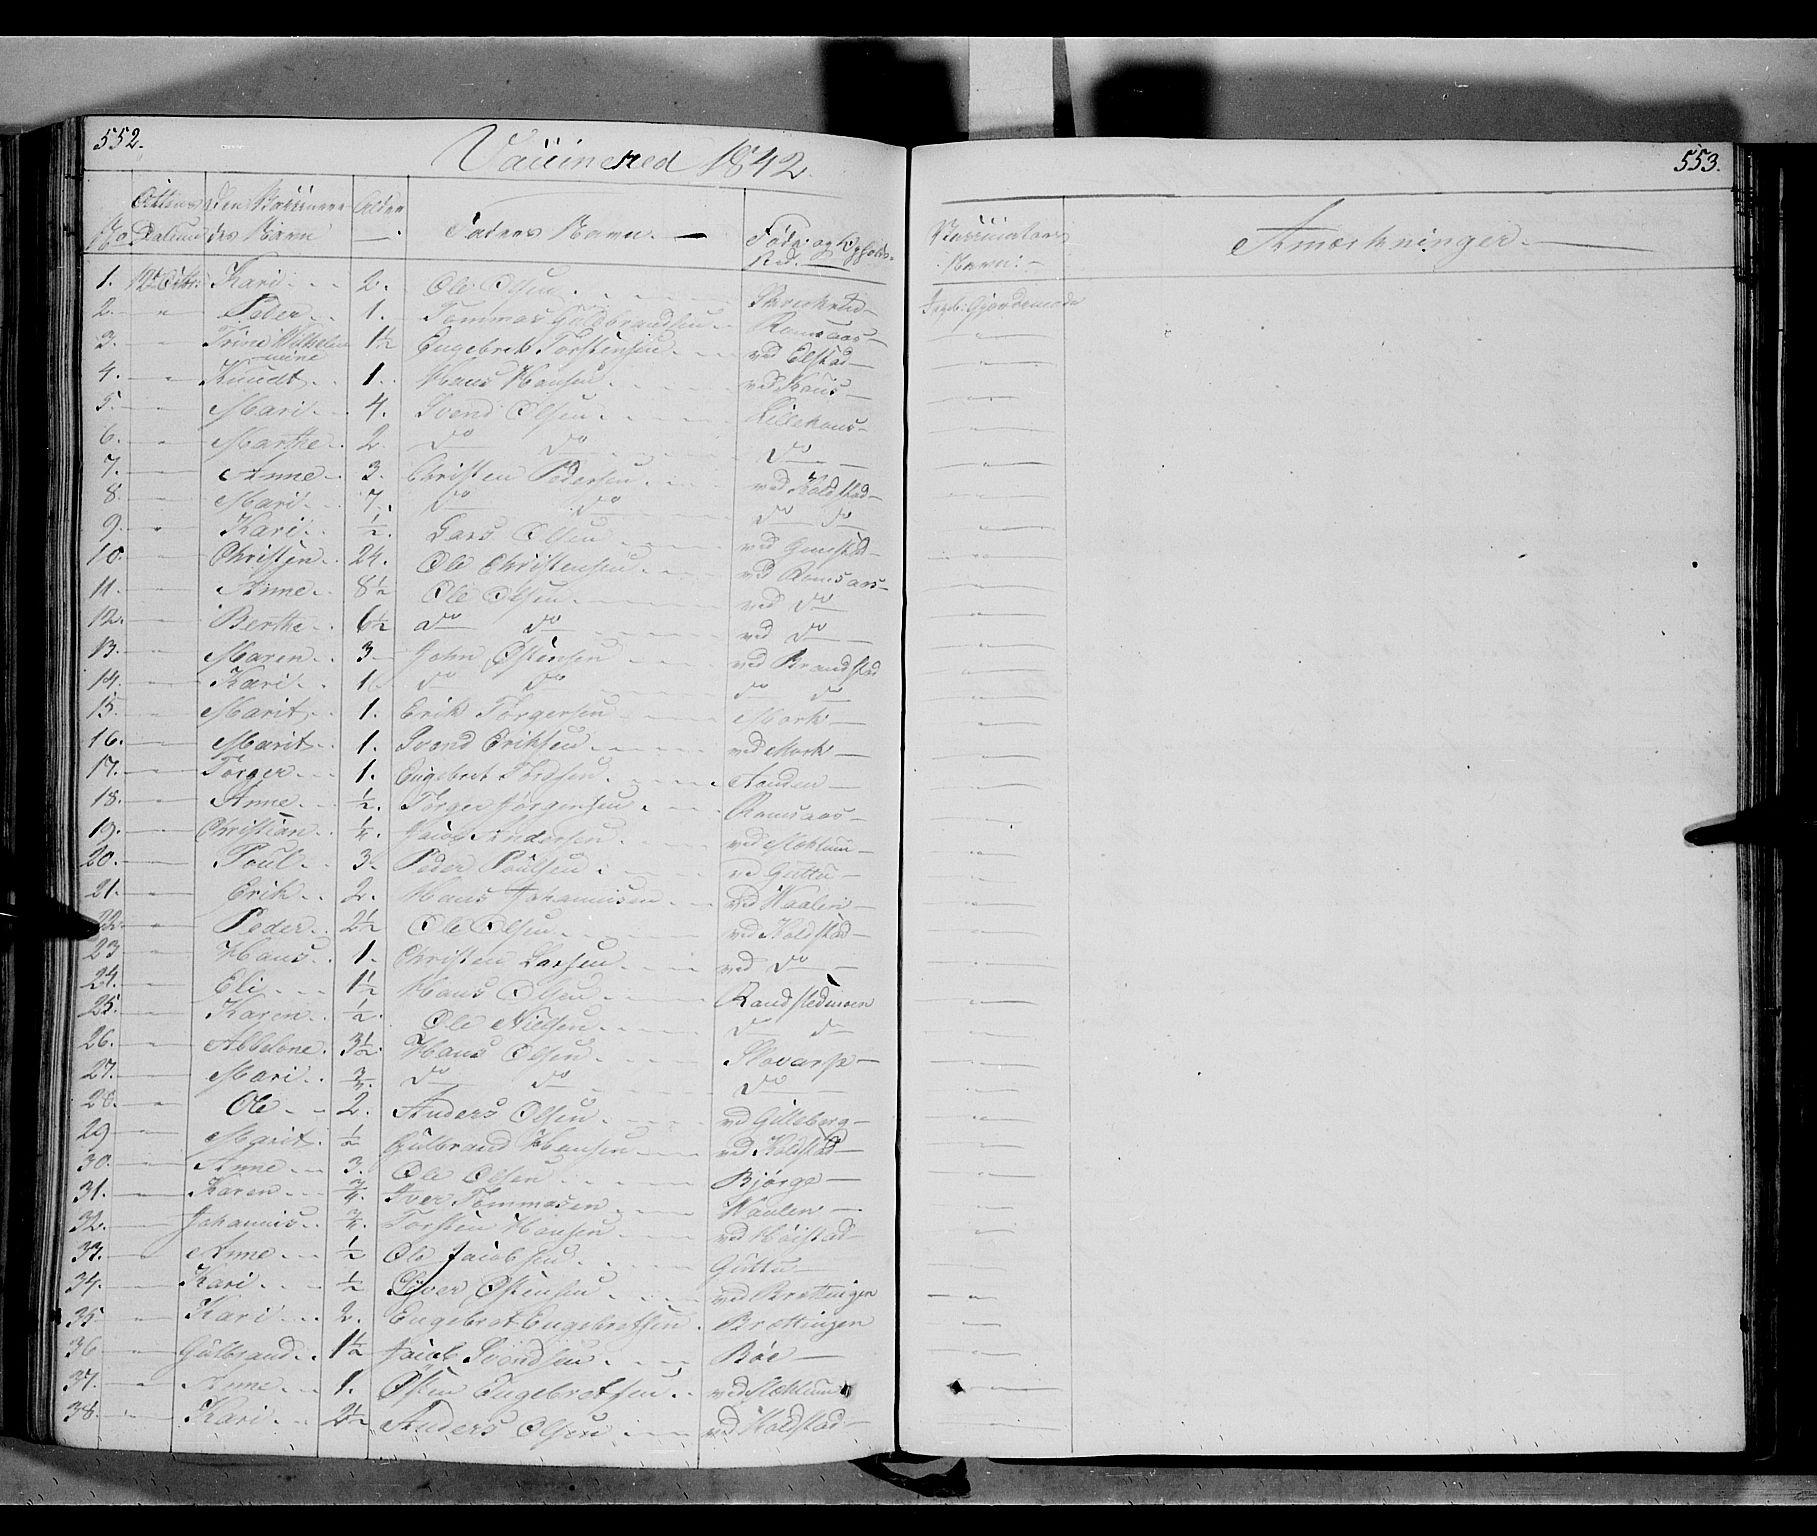 SAH, Ringebu prestekontor, Ministerialbok nr. 5, 1839-1848, s. 552-553